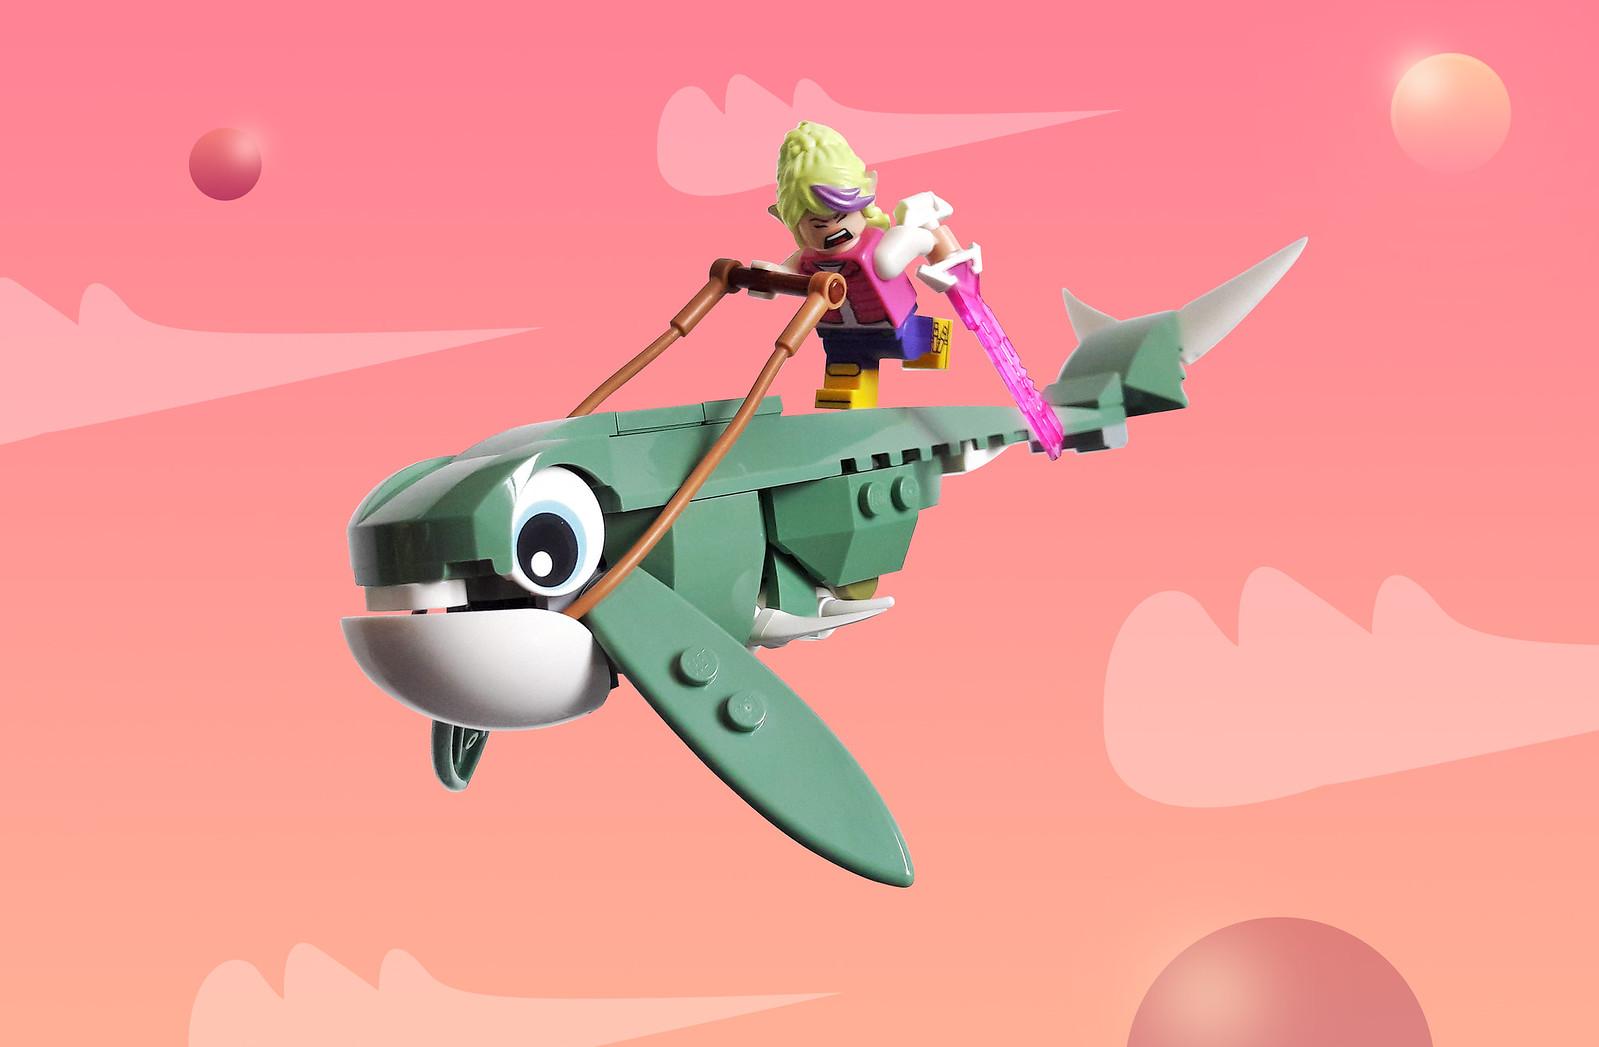 Fifi - The Warrior Princess and the hunt for Tatsu, The Magic Whale